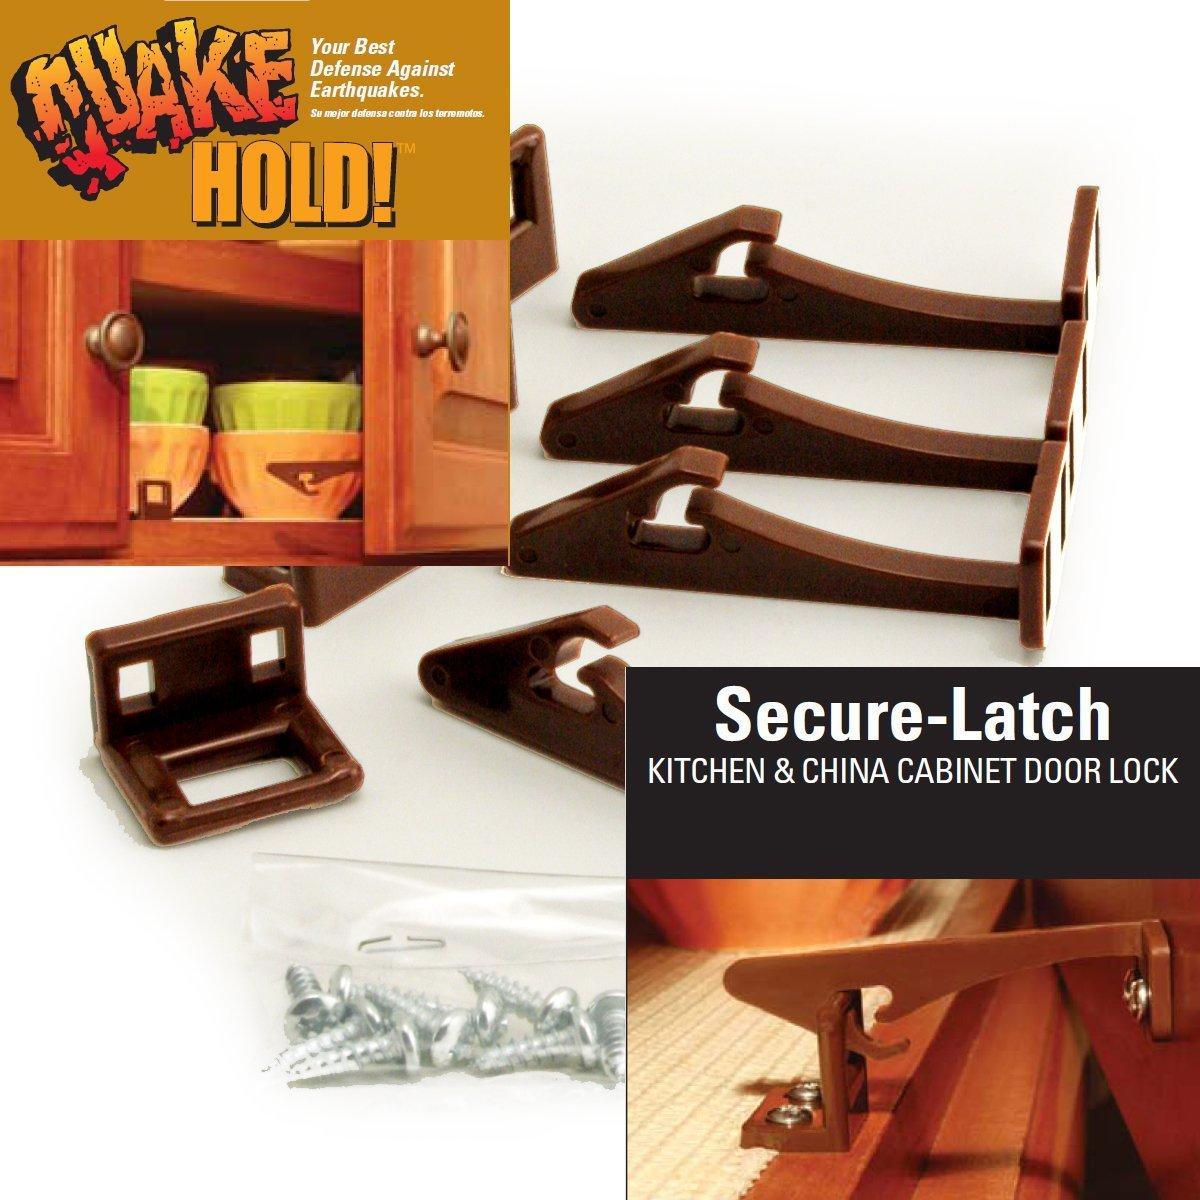 Quake Hold! Secure-Latch Kitchen & China Cabinet Door Locks ...